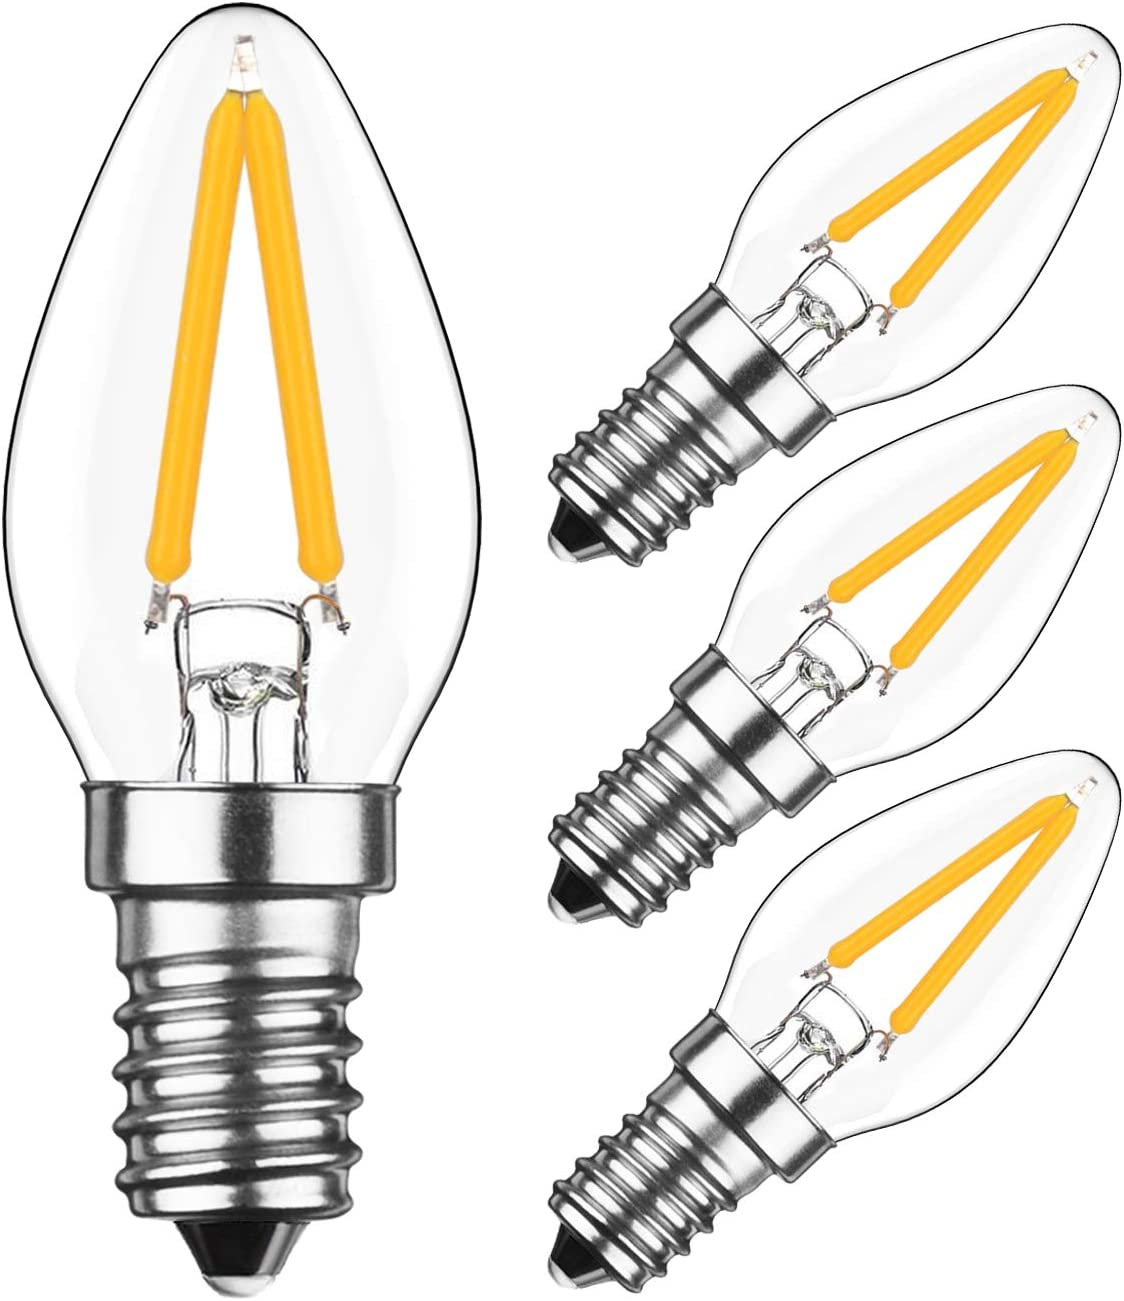 specialty shop HzSane 2W LED Filament C7 Night White Light Max 56% OFF Bulb Warm 2700K 200